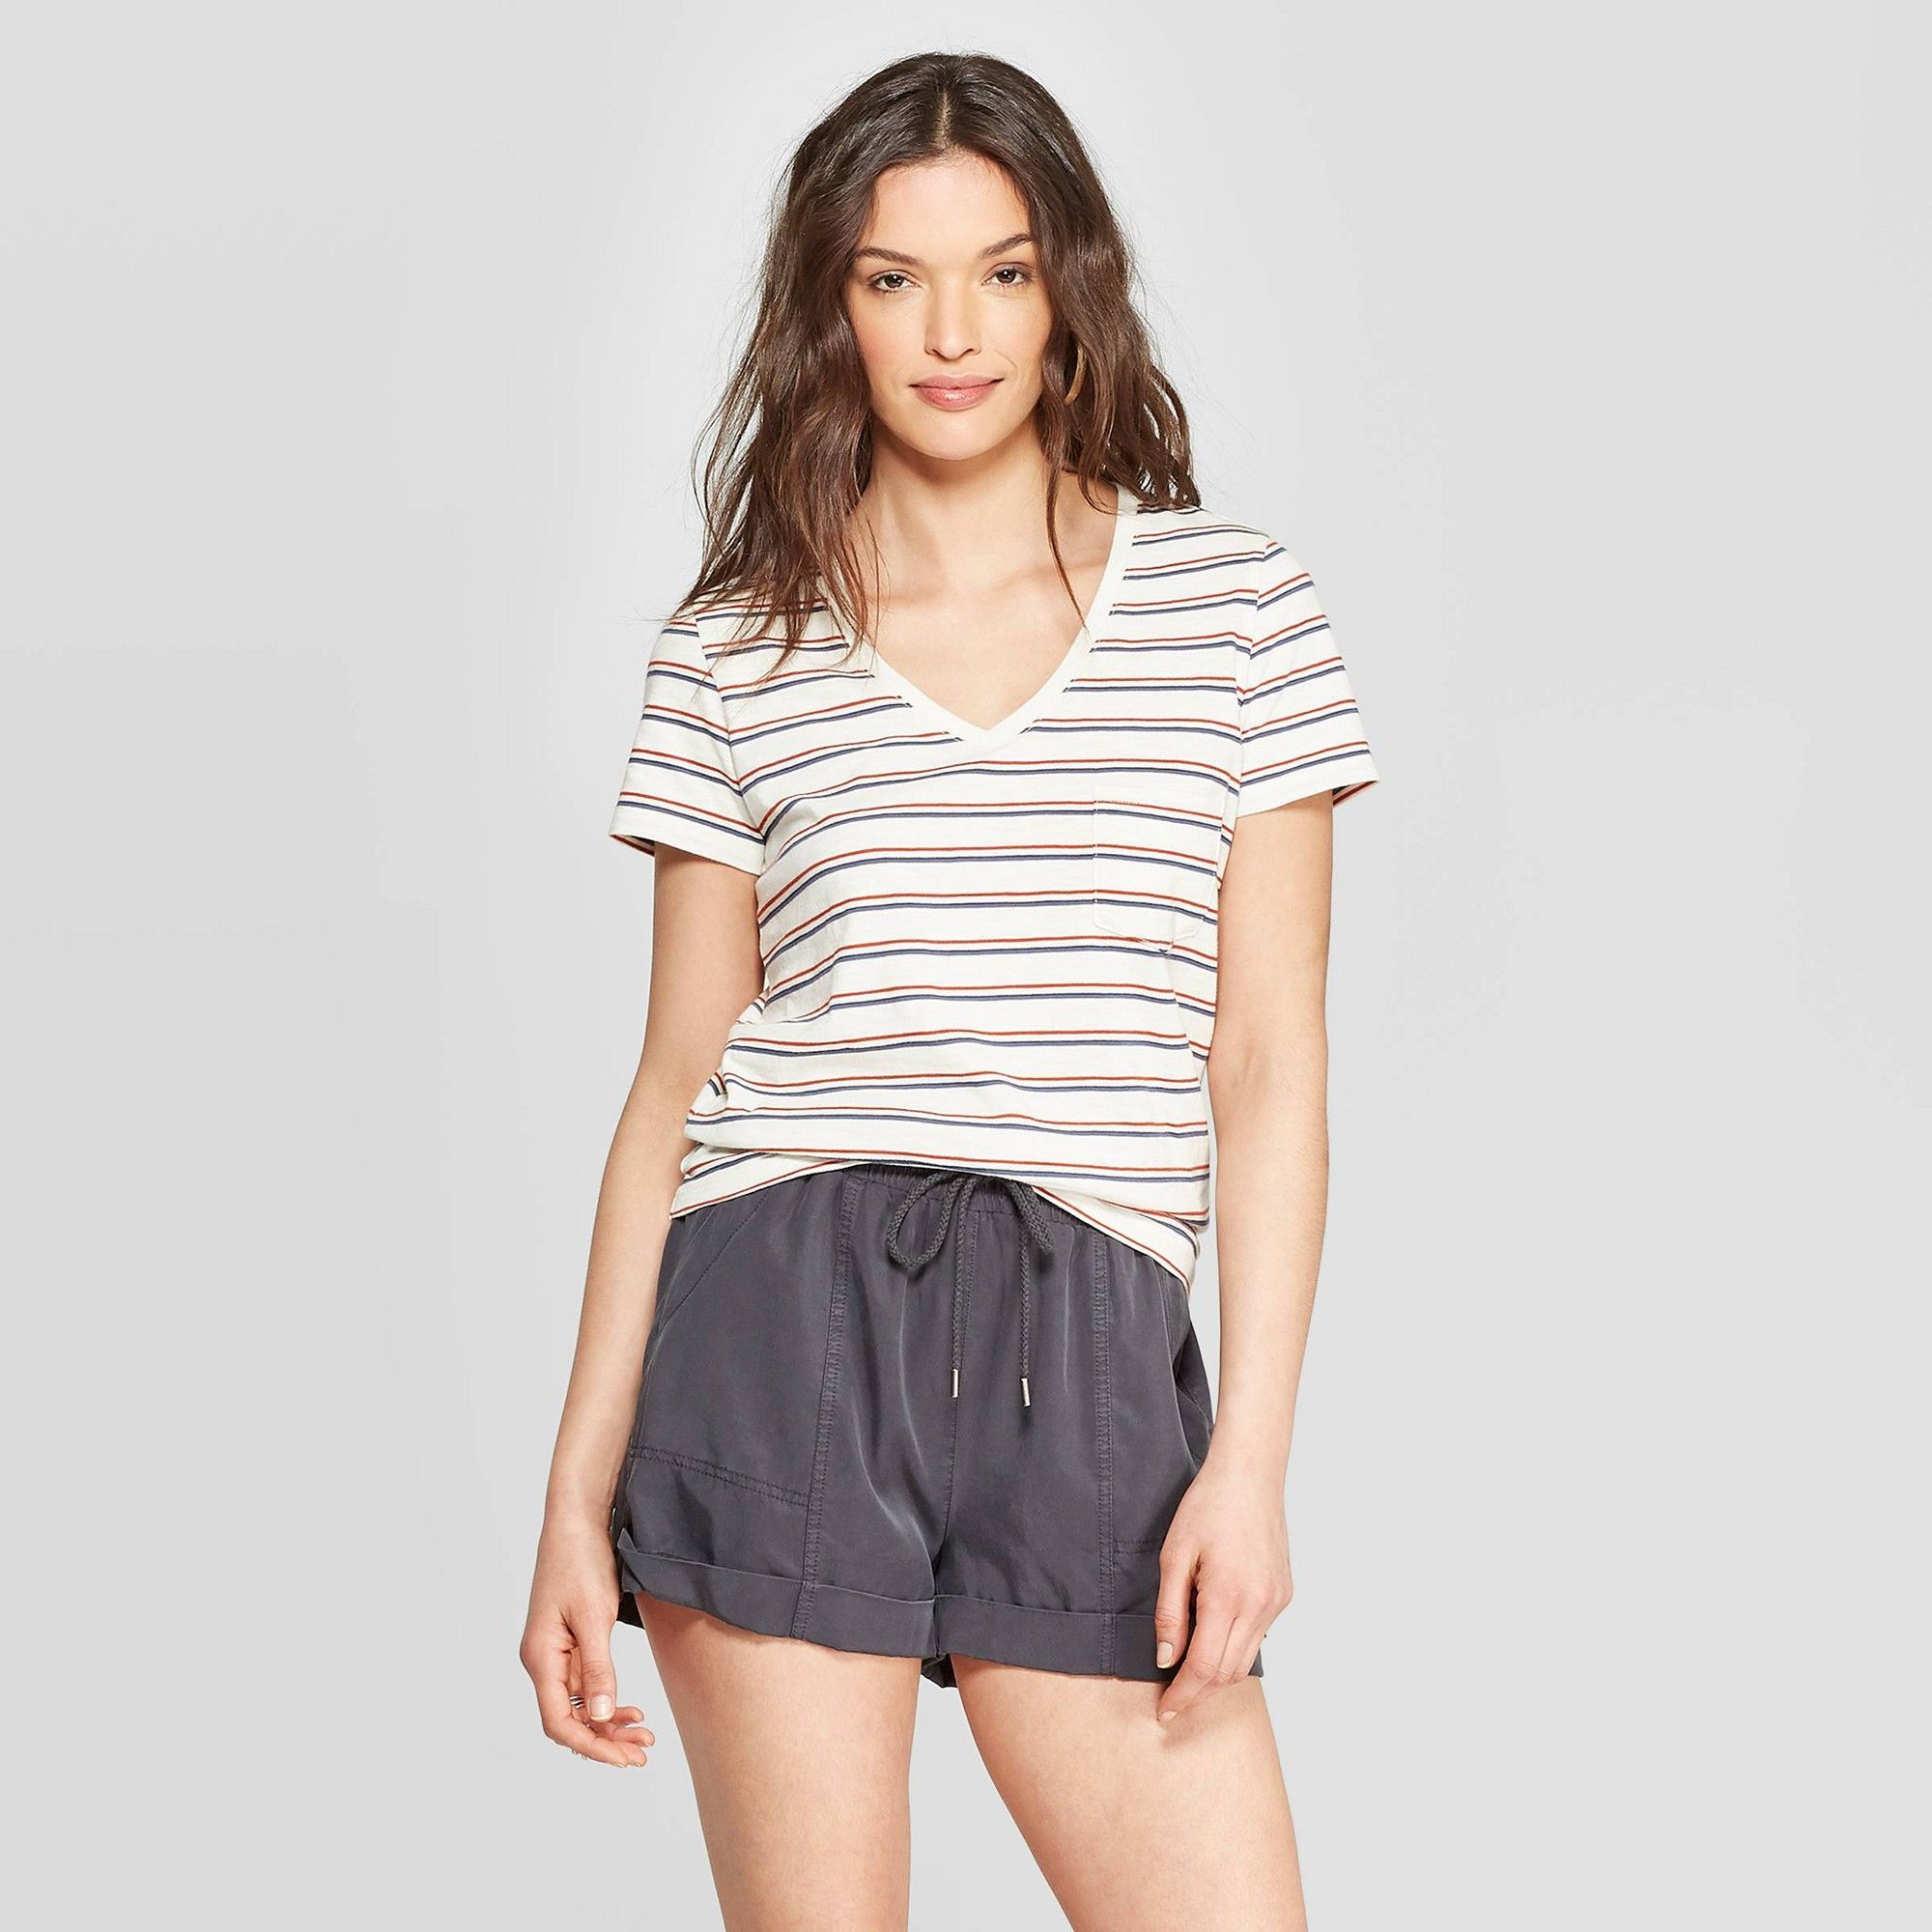 319dabb437 Women's Short Sleeve V-Neck Striped Monterey Pocket T-Shirt ...